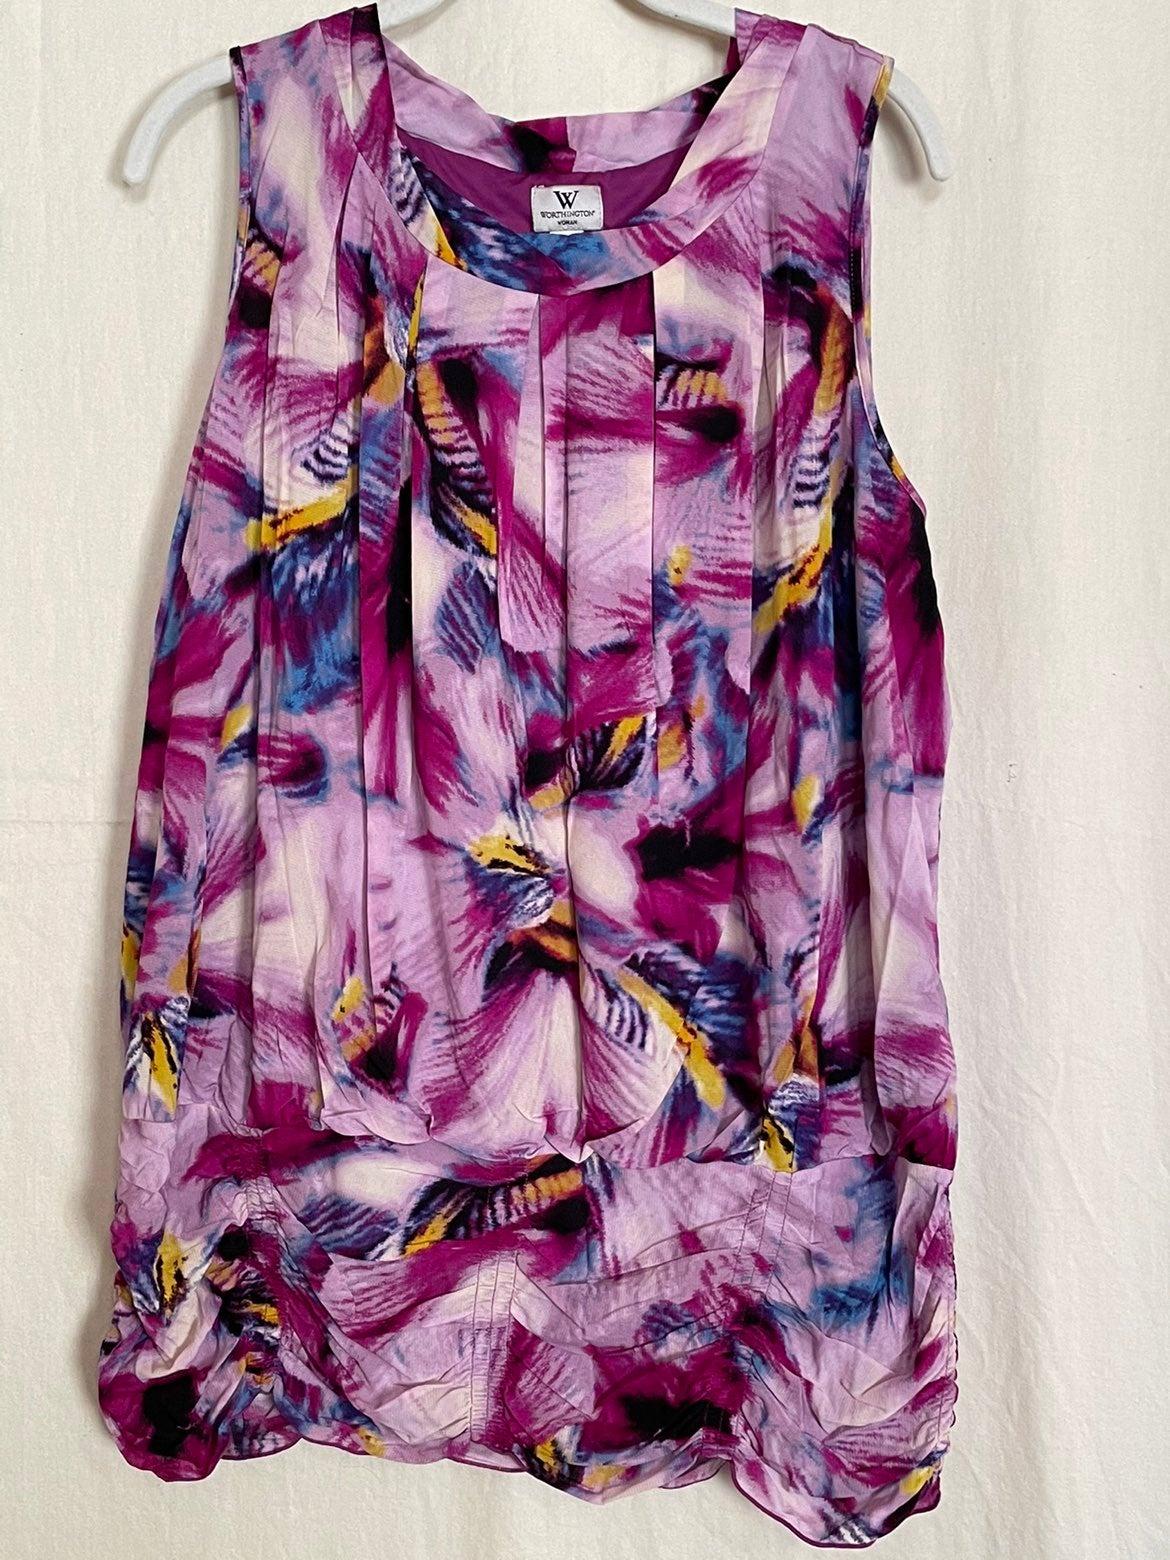 Worthington sleeveless blouse